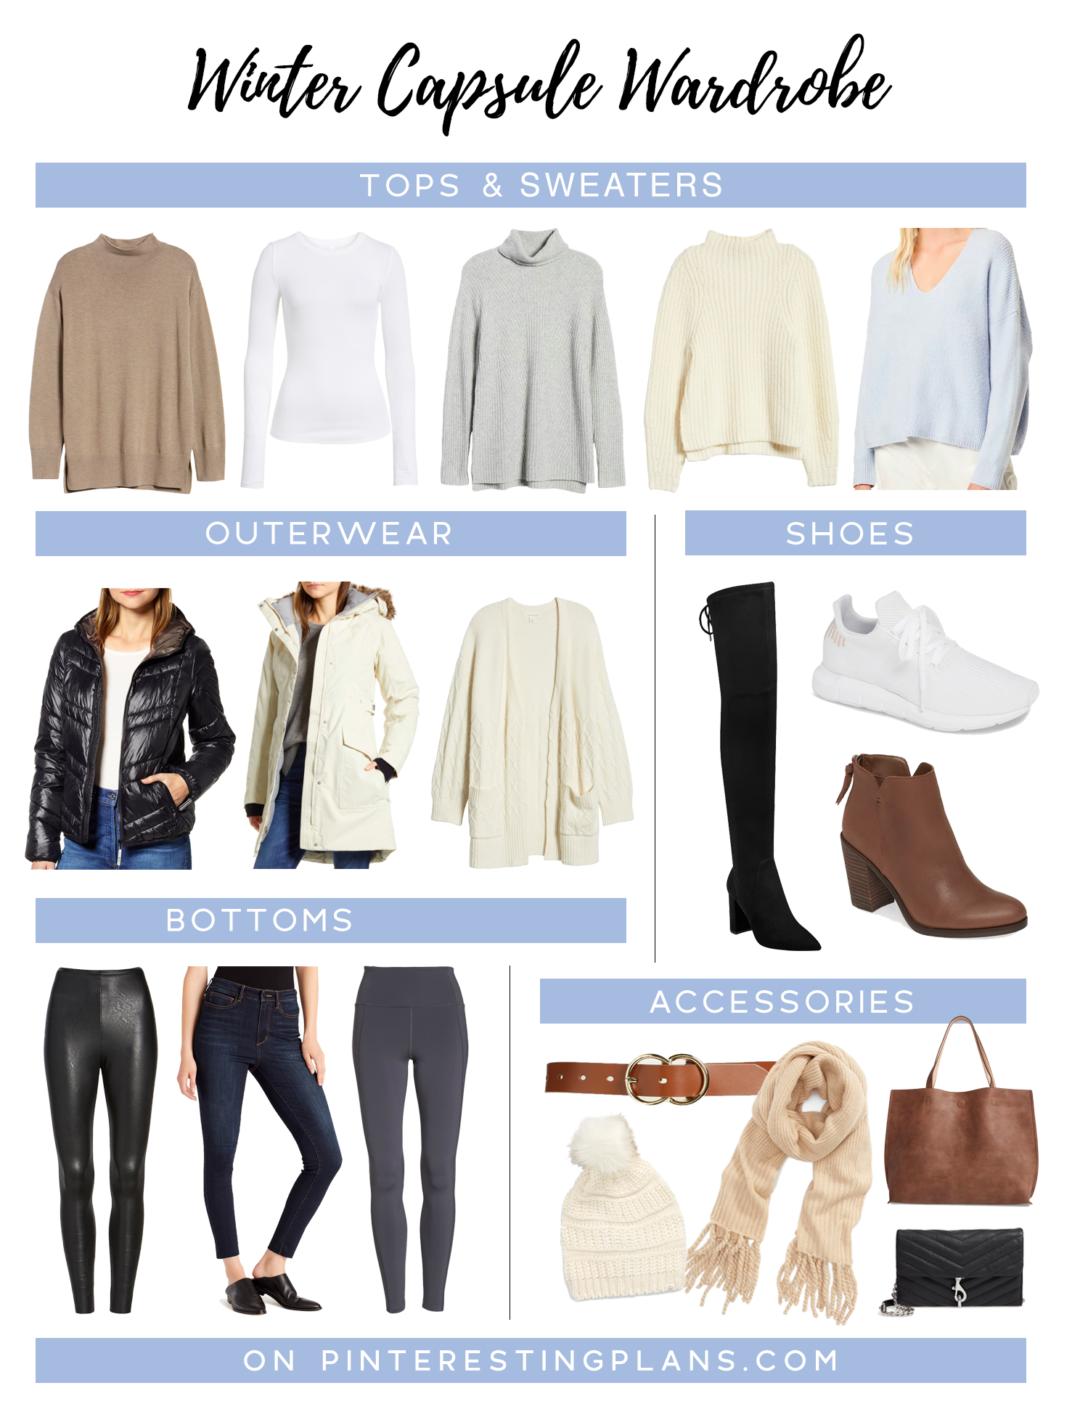 womens minimalist winter capsule wardrobe on Pinteresting plans fashion blog